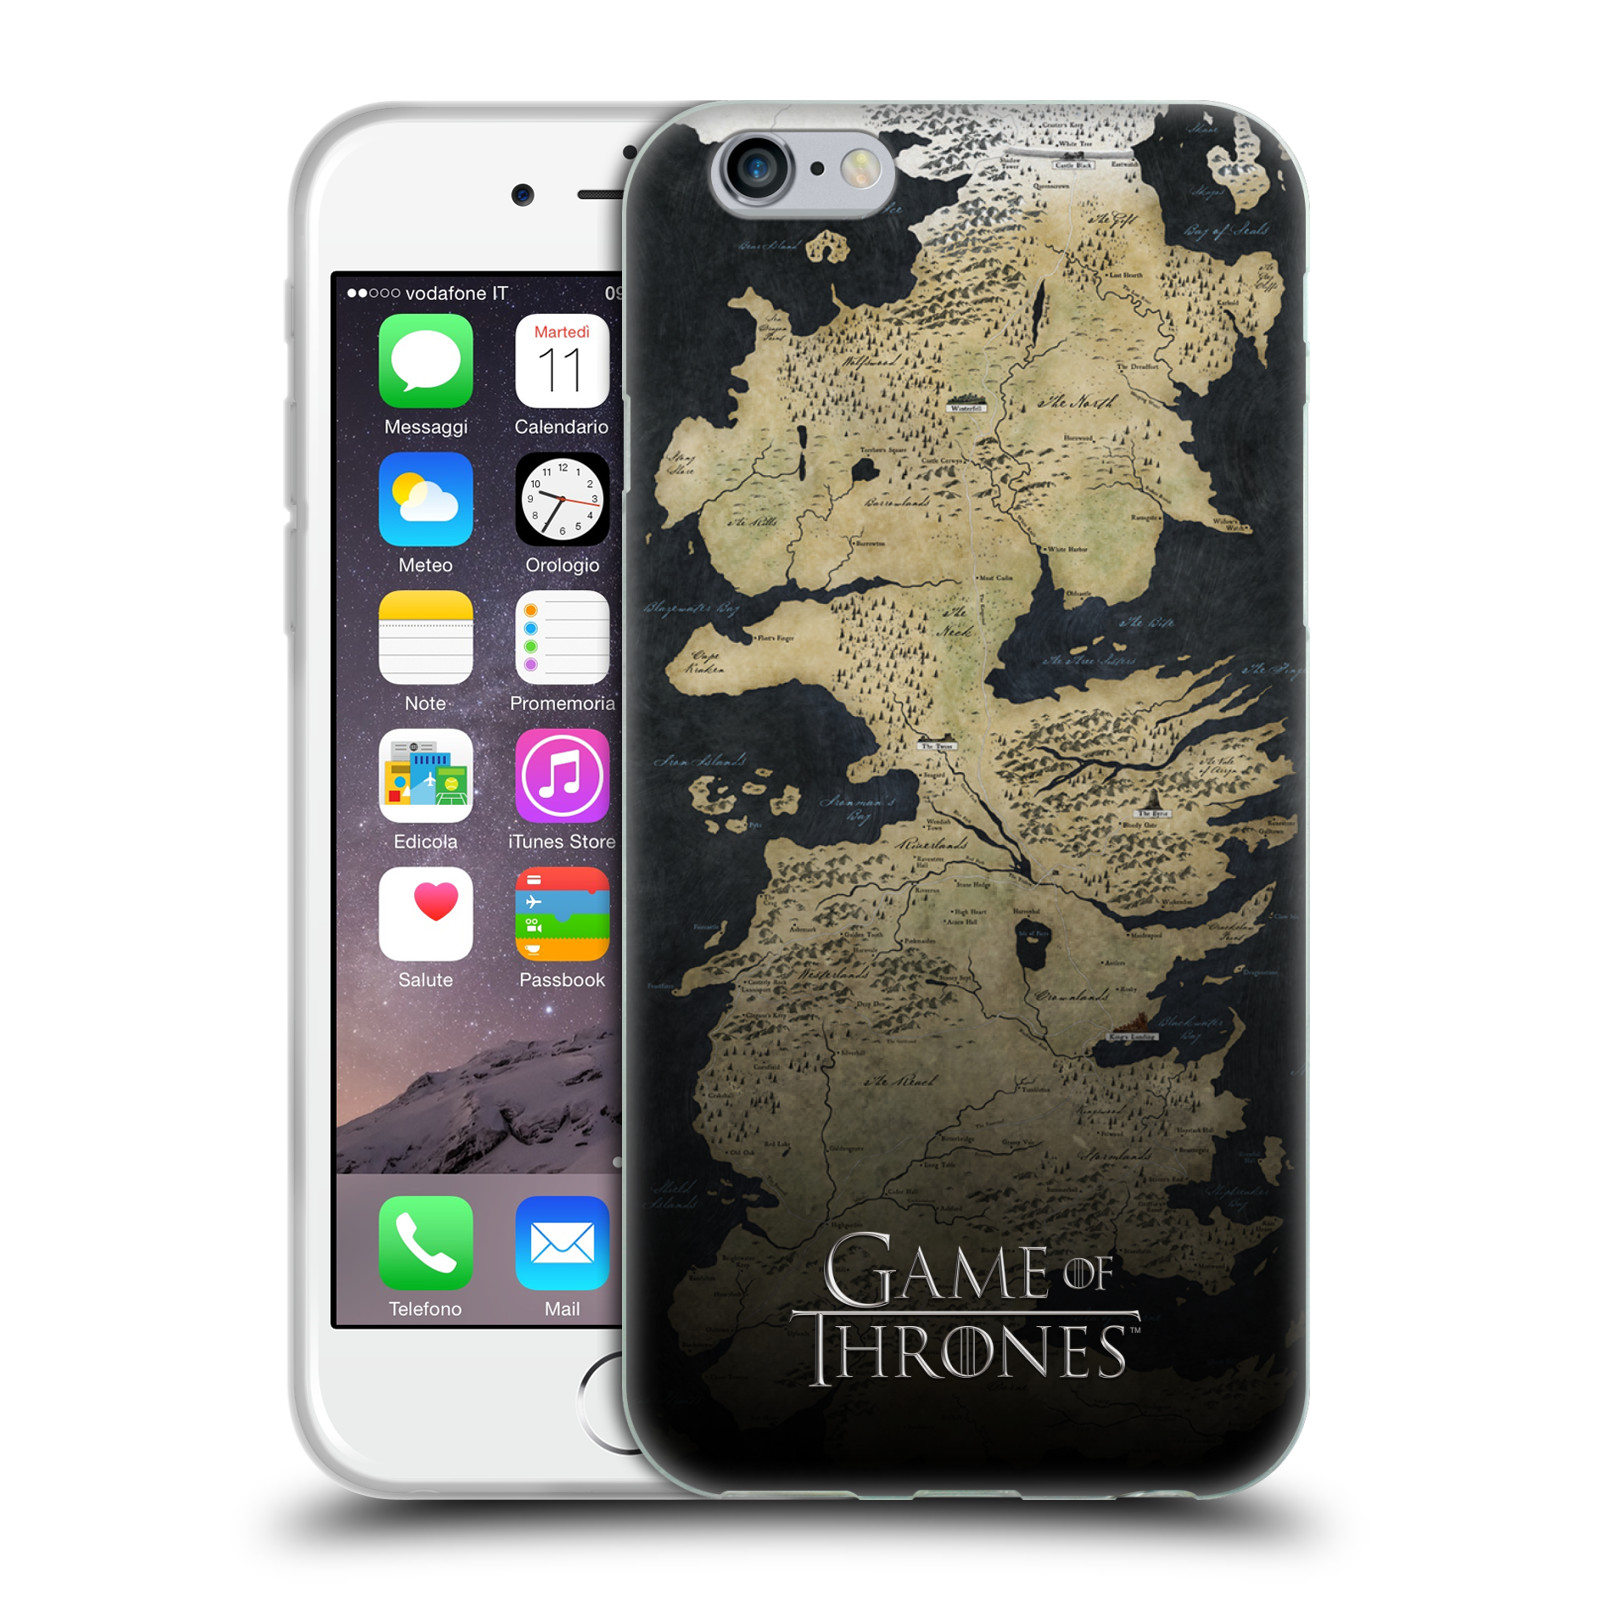 Silikonové pouzdro na mobil Apple iPhone 6 HEAD CASE Hra o trůny - Mapa západozemí